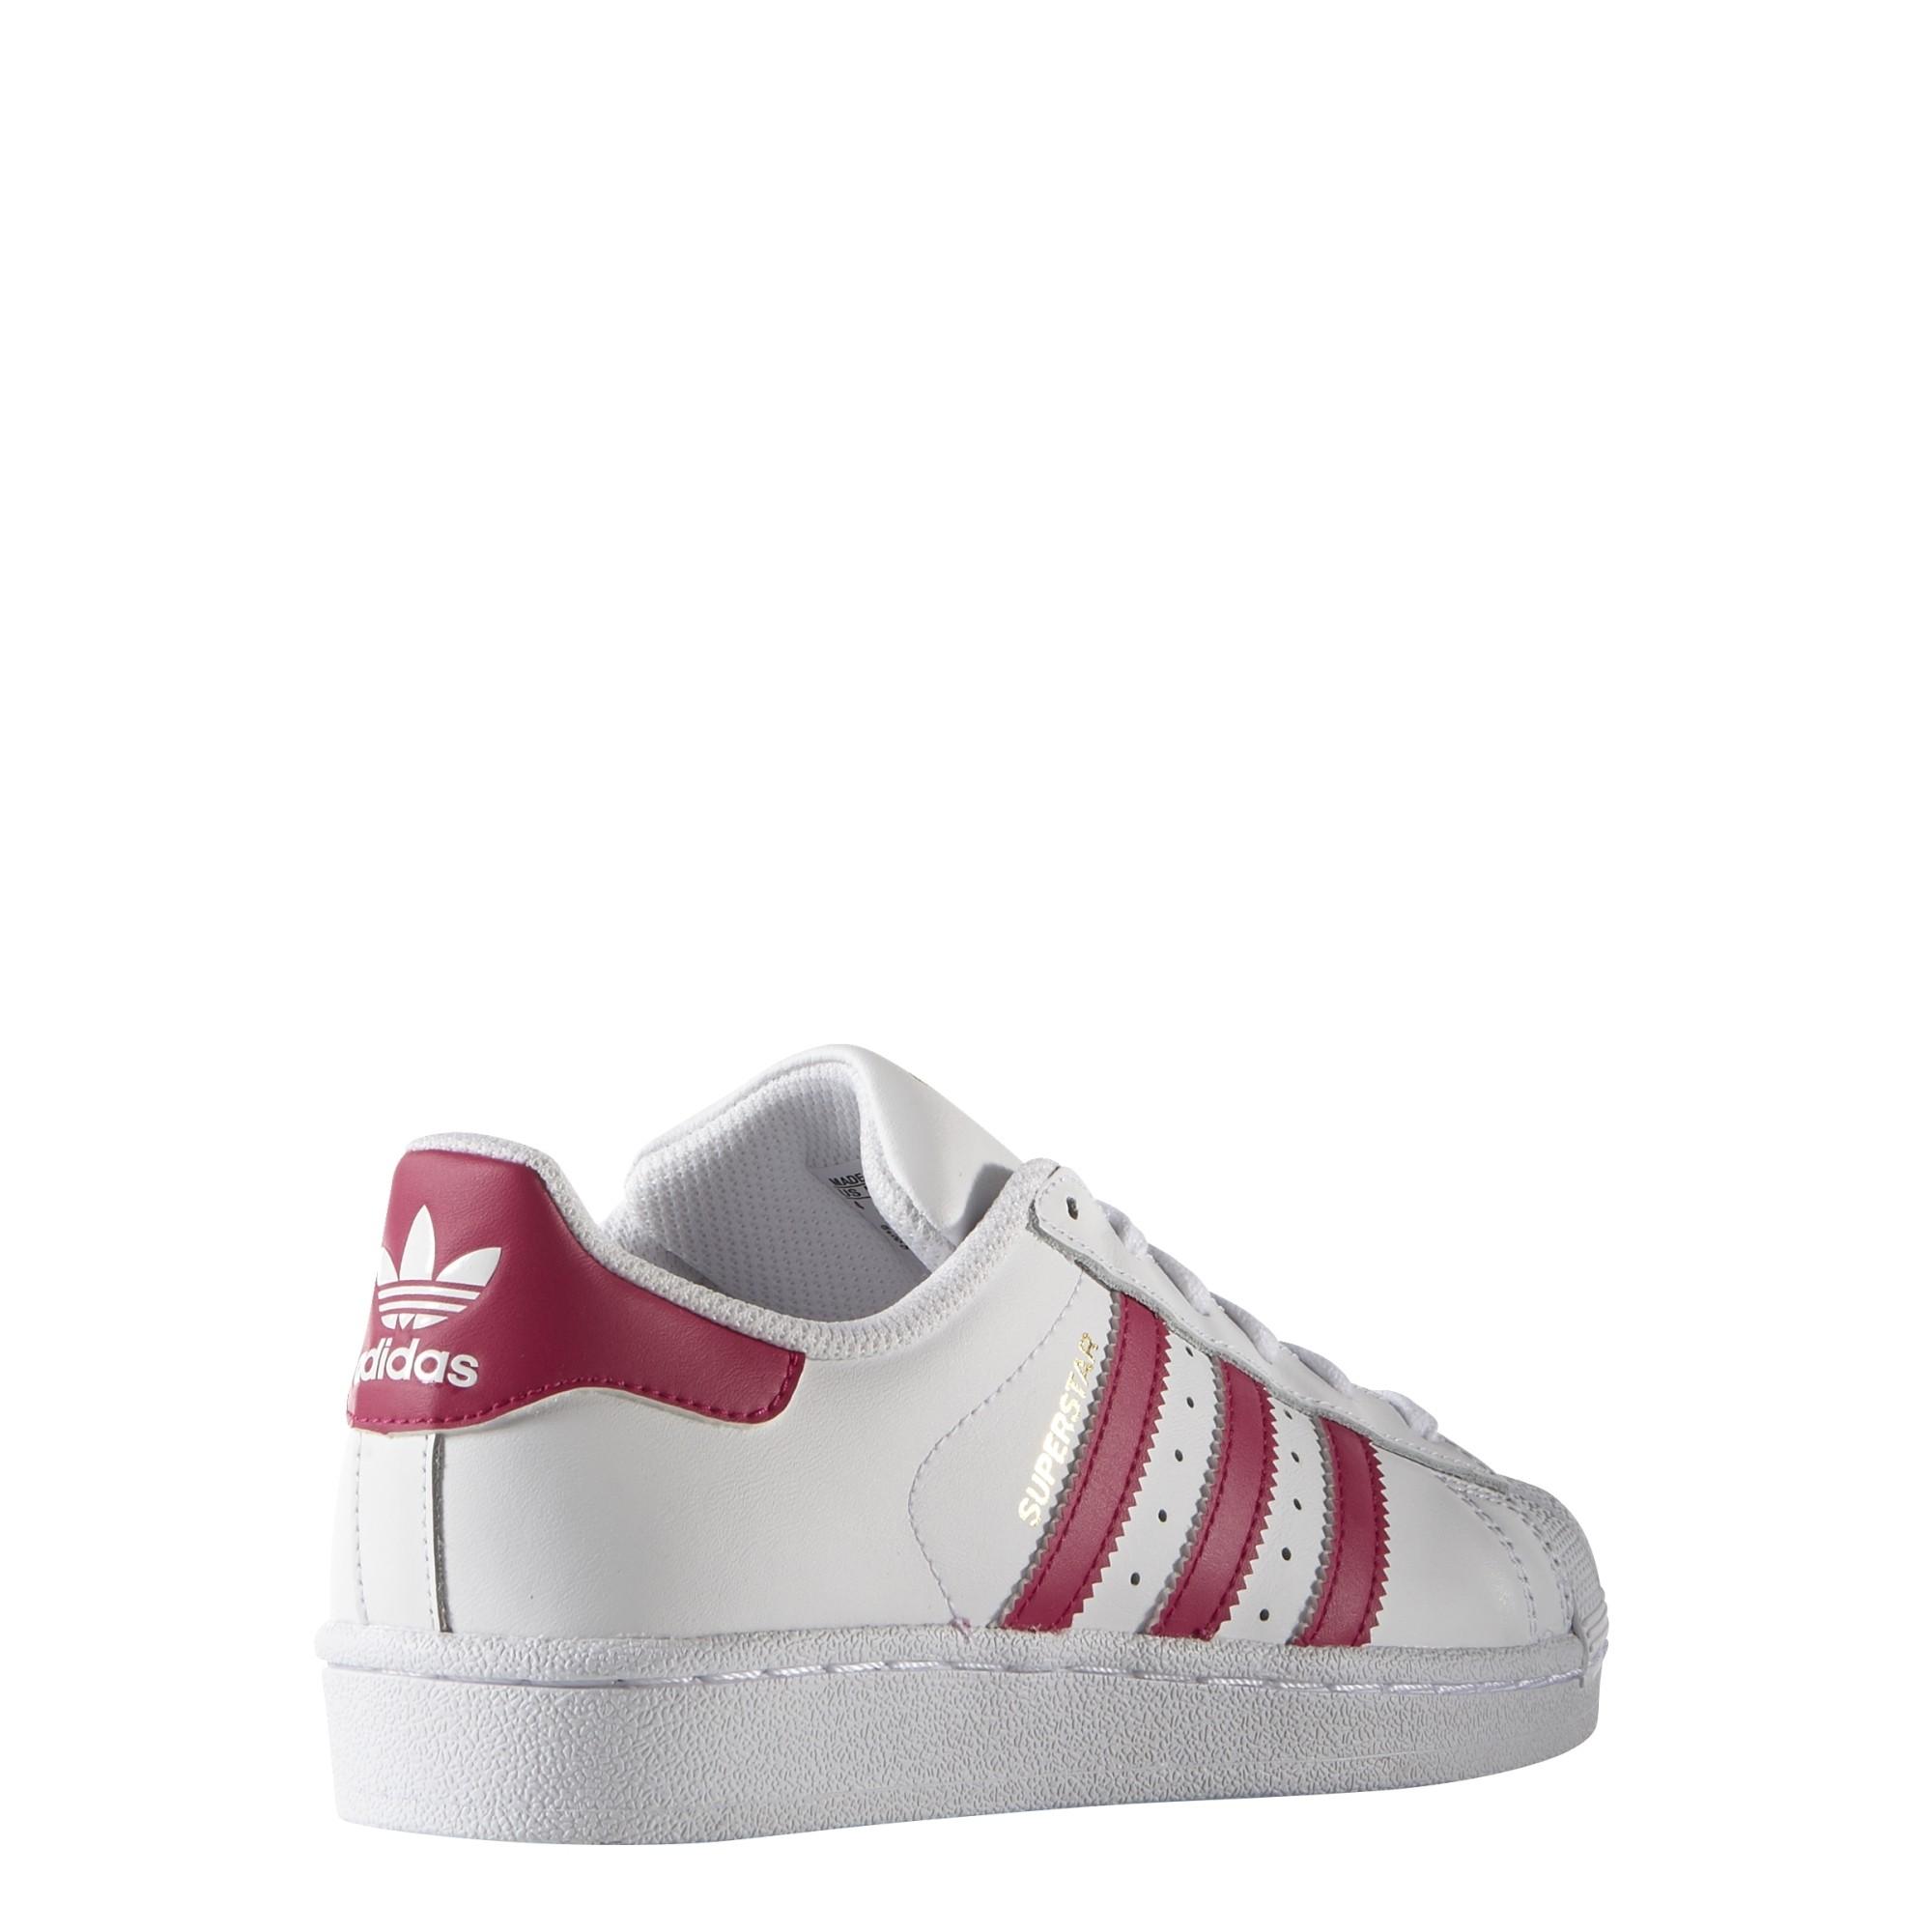 scarpe adidas superstar bambina 35